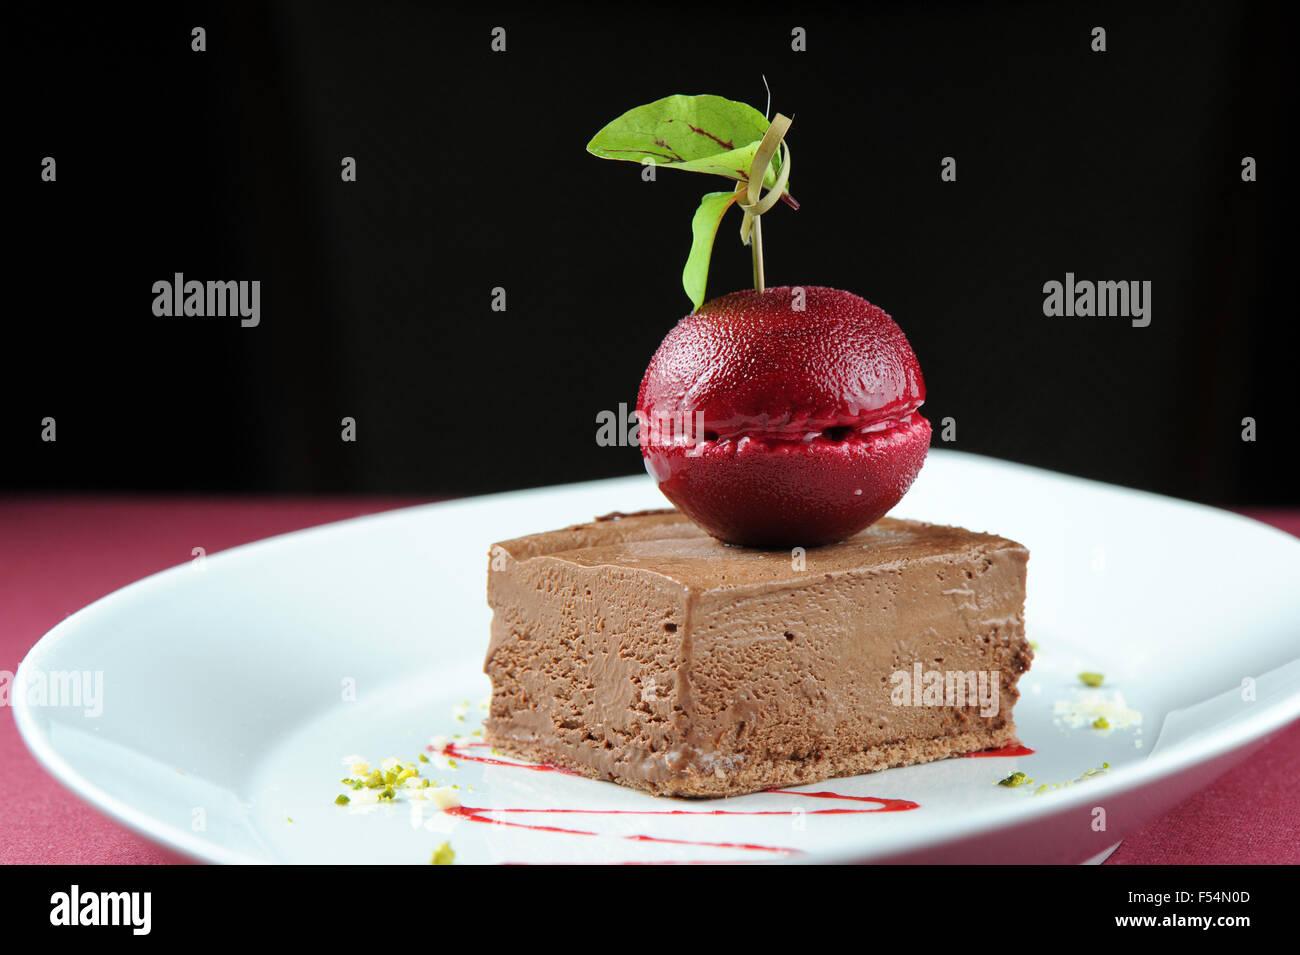 Ratón Chocolate Gourmet postre helado con un sorbete de color cereza oscuro. Imagen De Stock